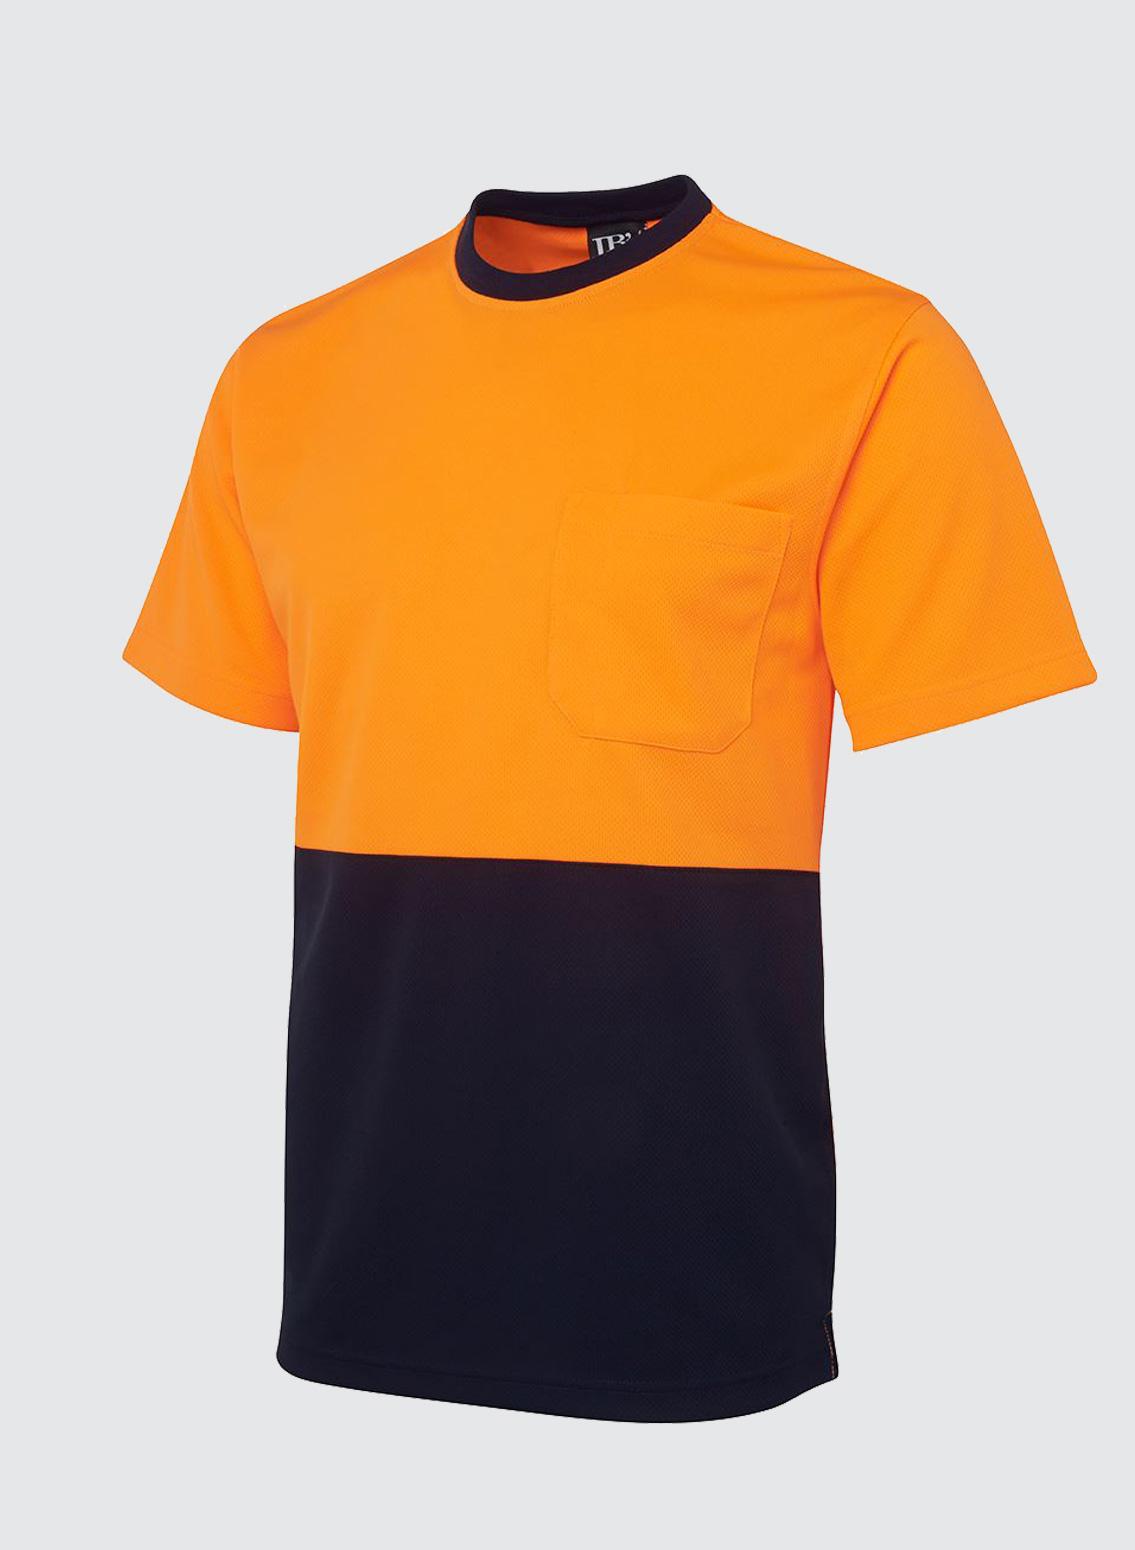 6hvt Hi Vis Traditonal T Shirt Business Image Group